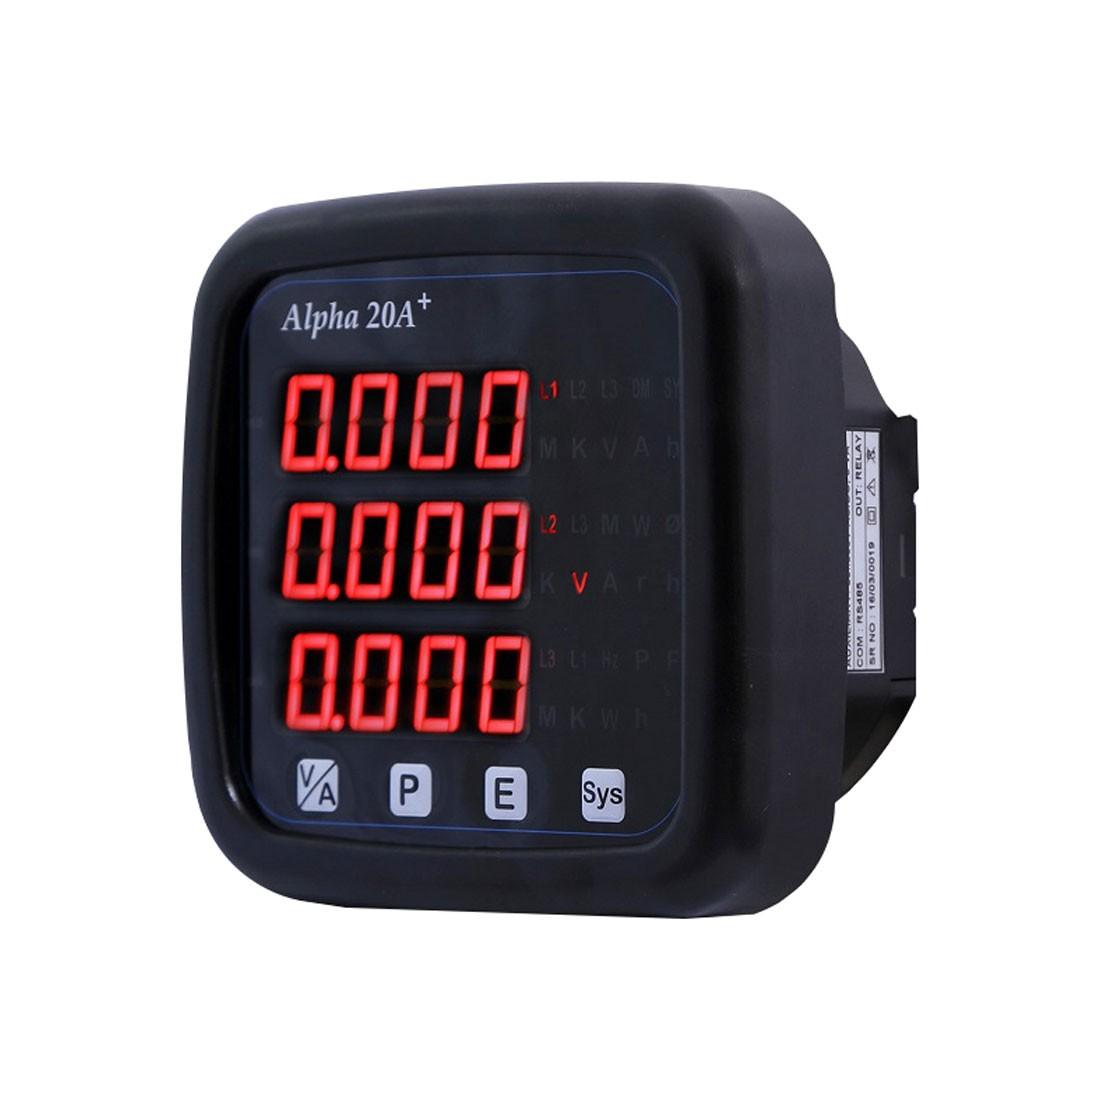 Alpha 20A+ Digital Multifunction LED Power Monitor